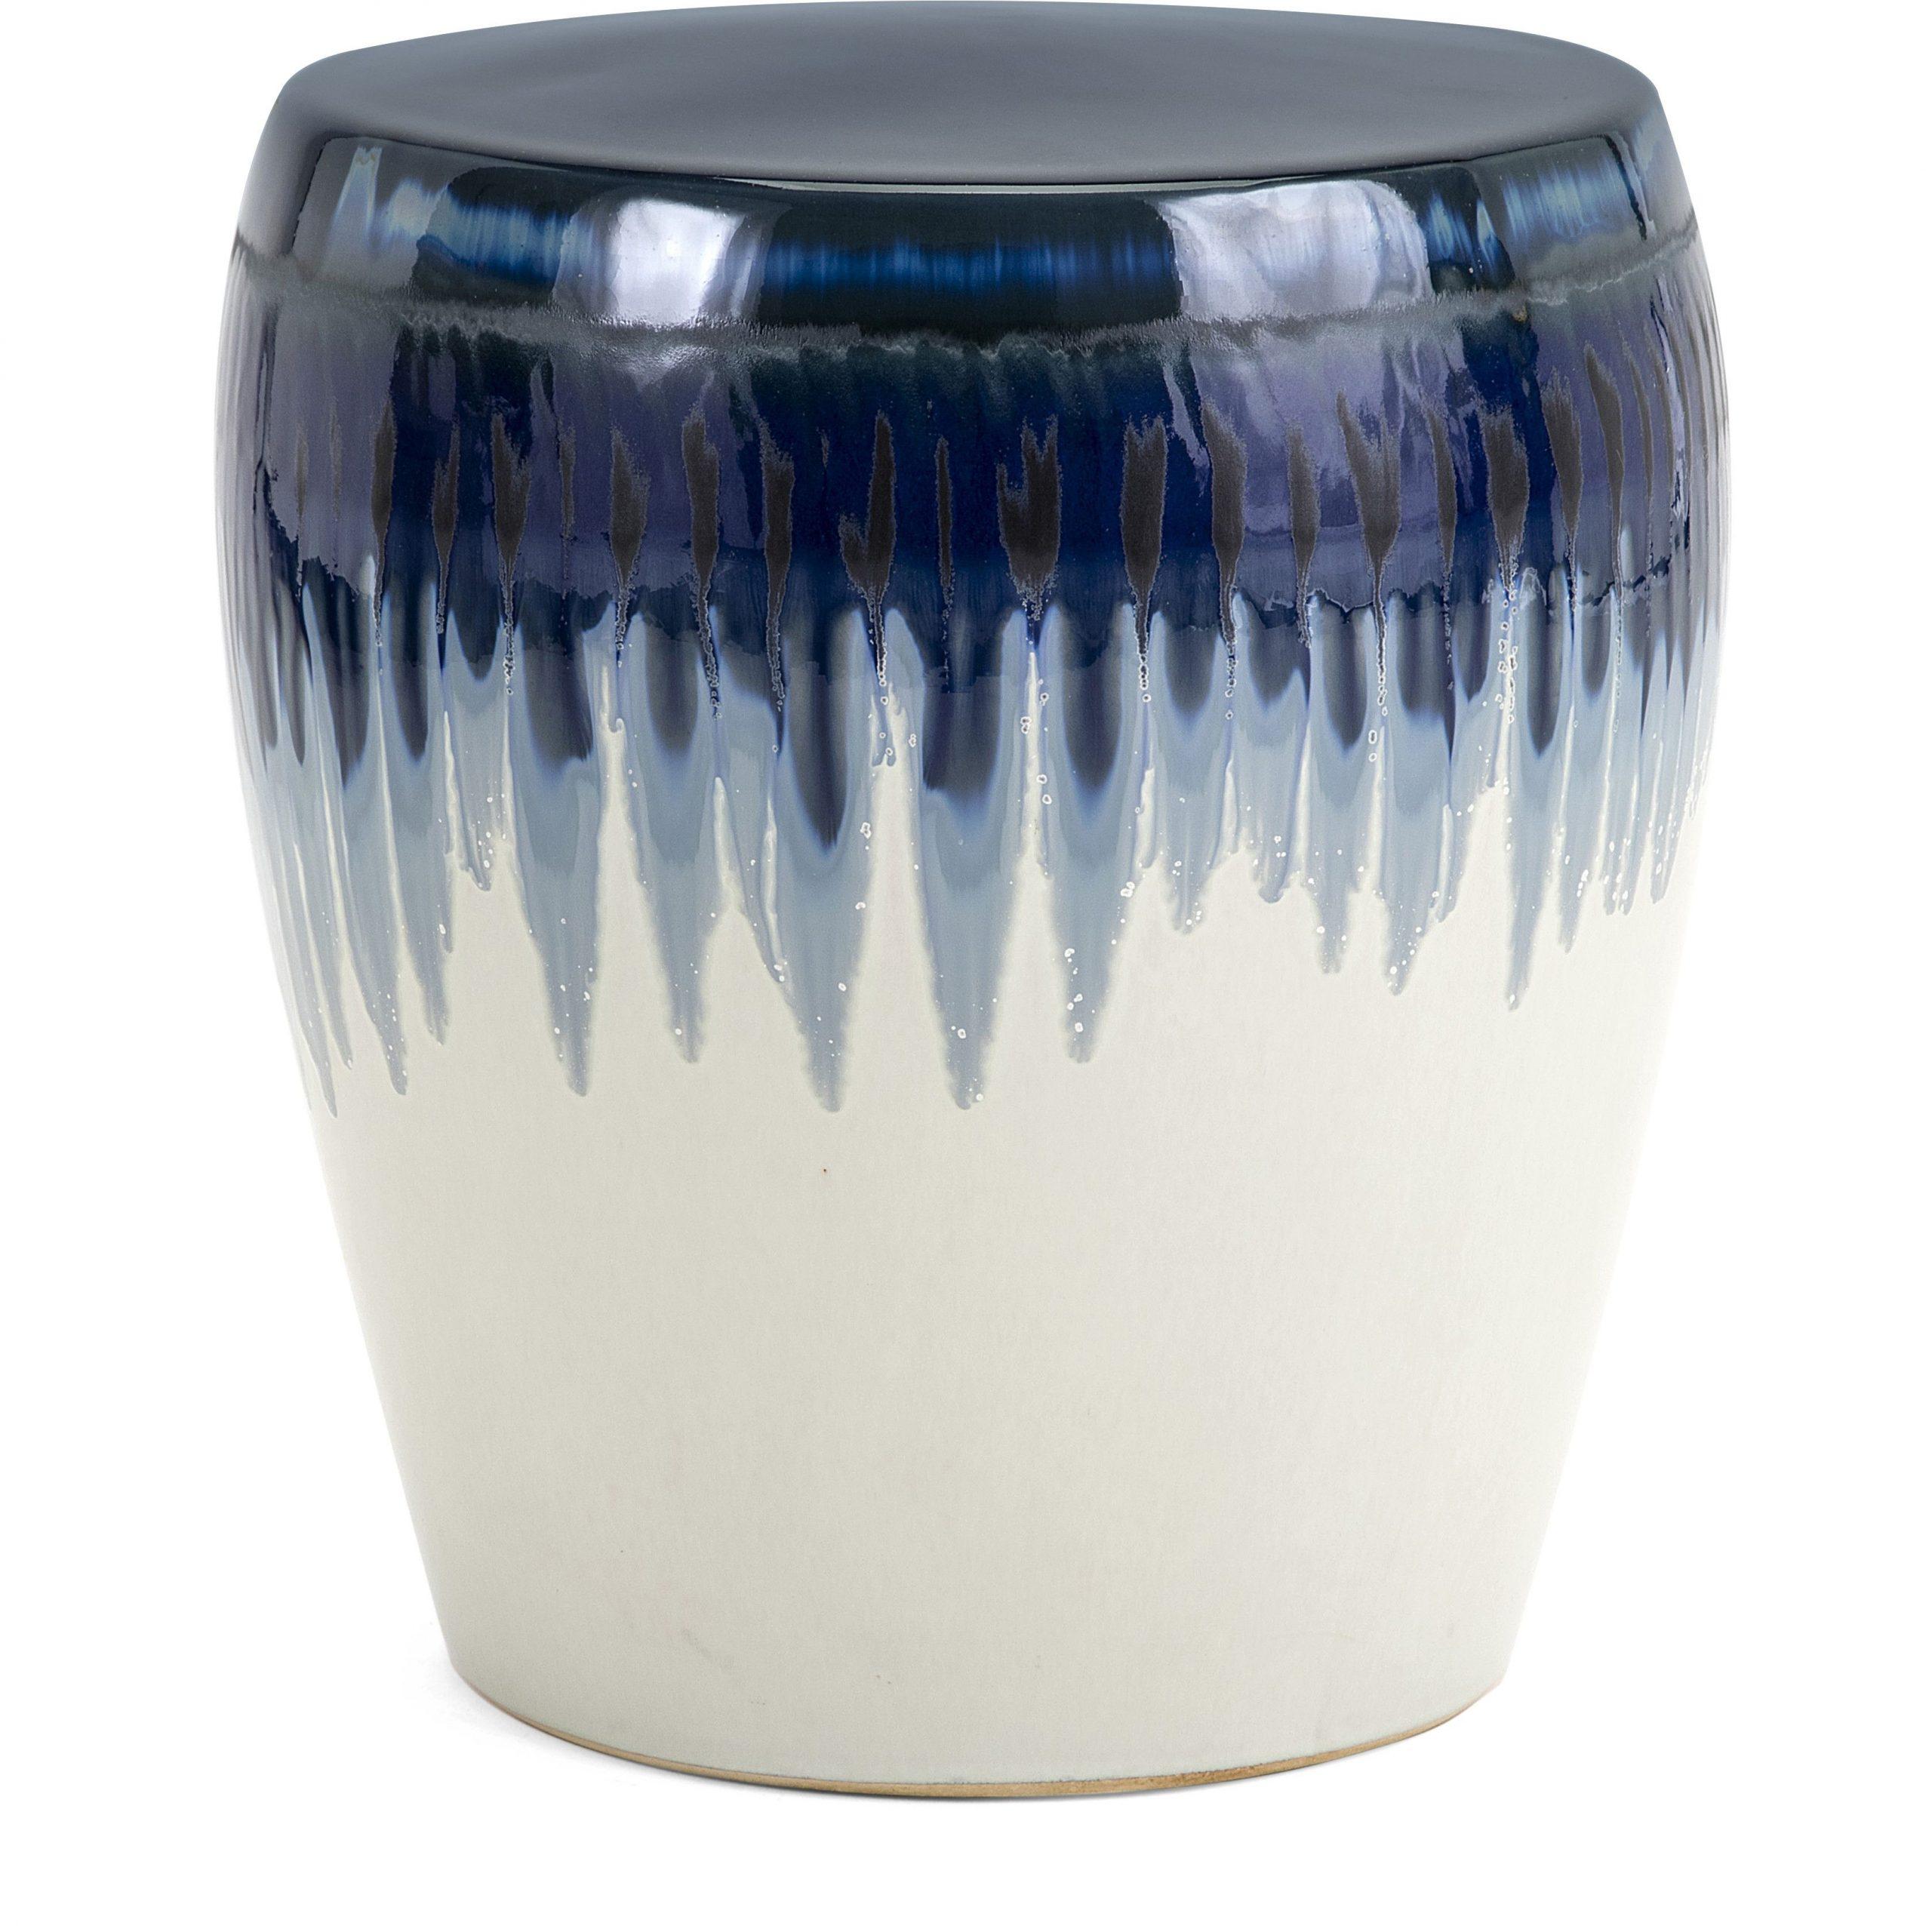 Hamako Ceramic Garden Stool Imax Imax 13724 | Ceramic Stool Throughout Ceramic Garden Stools (View 21 of 25)